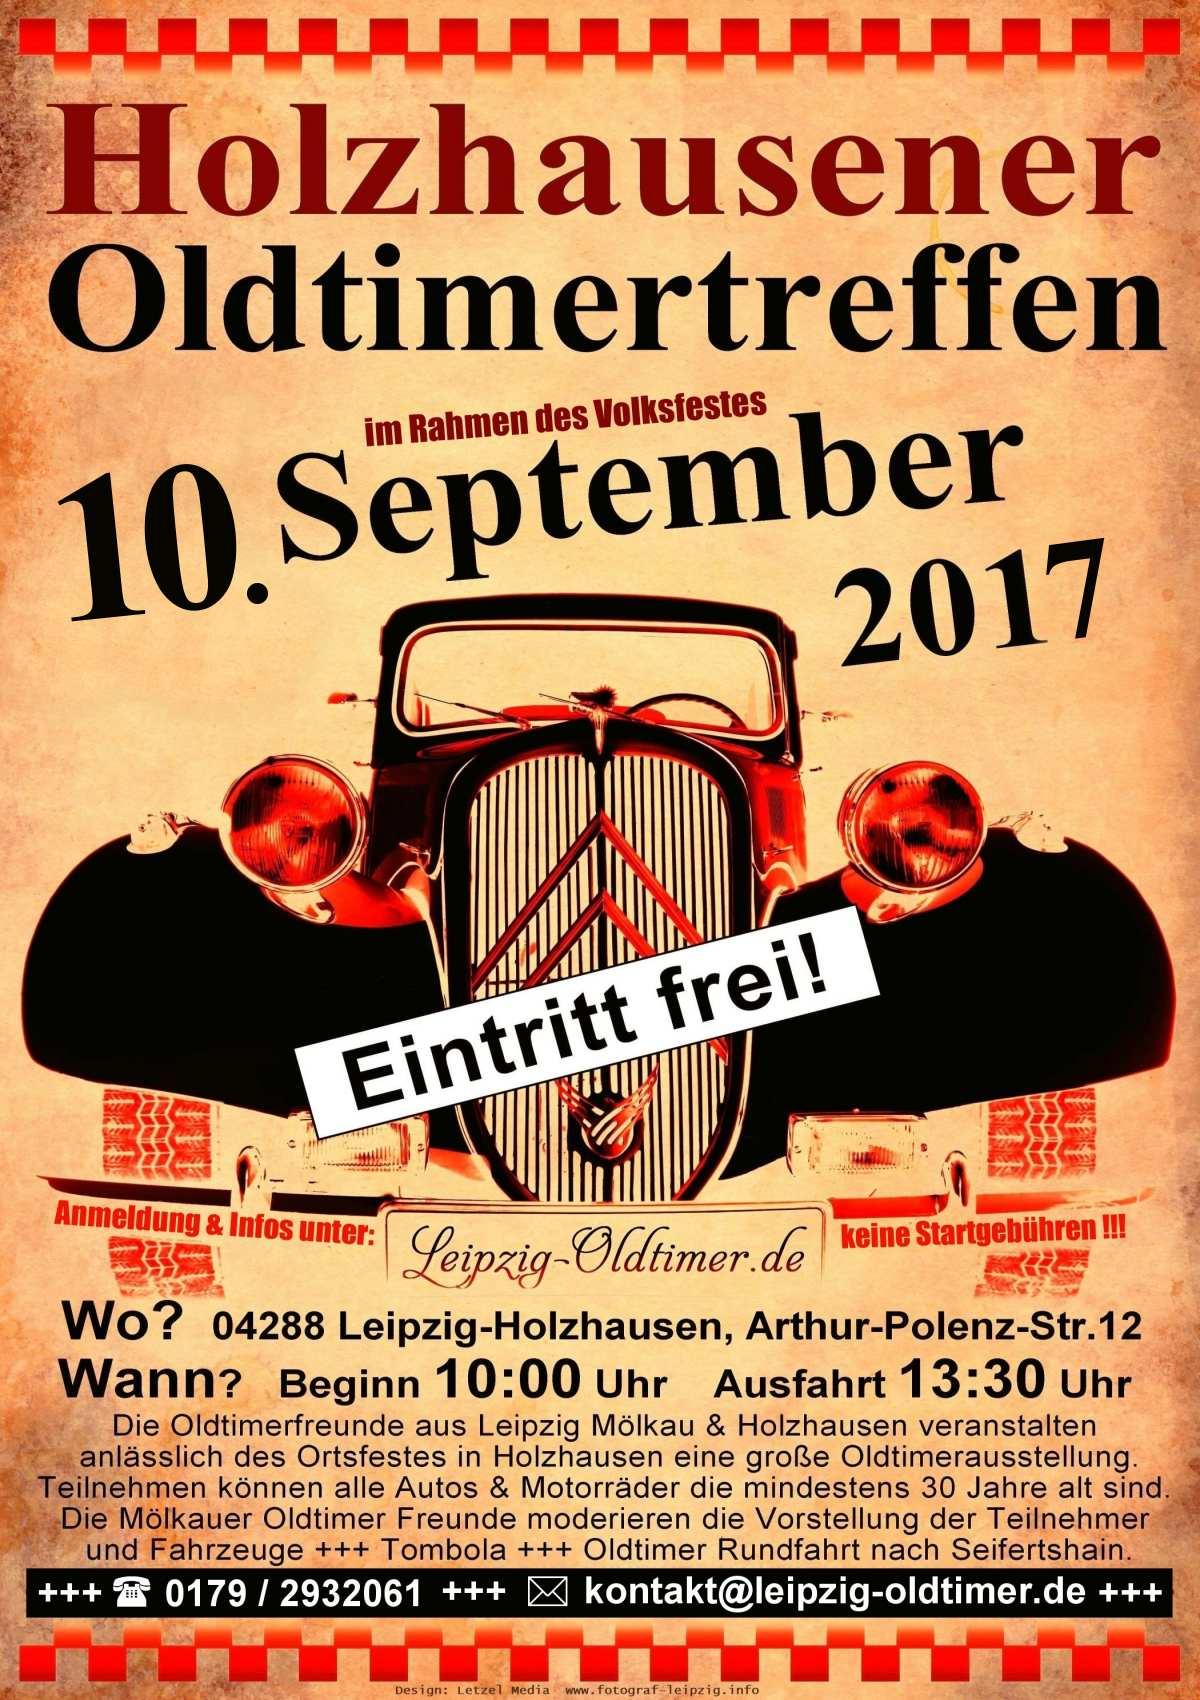 Plakat zum Oldtimertreffen in Leipzig 2017